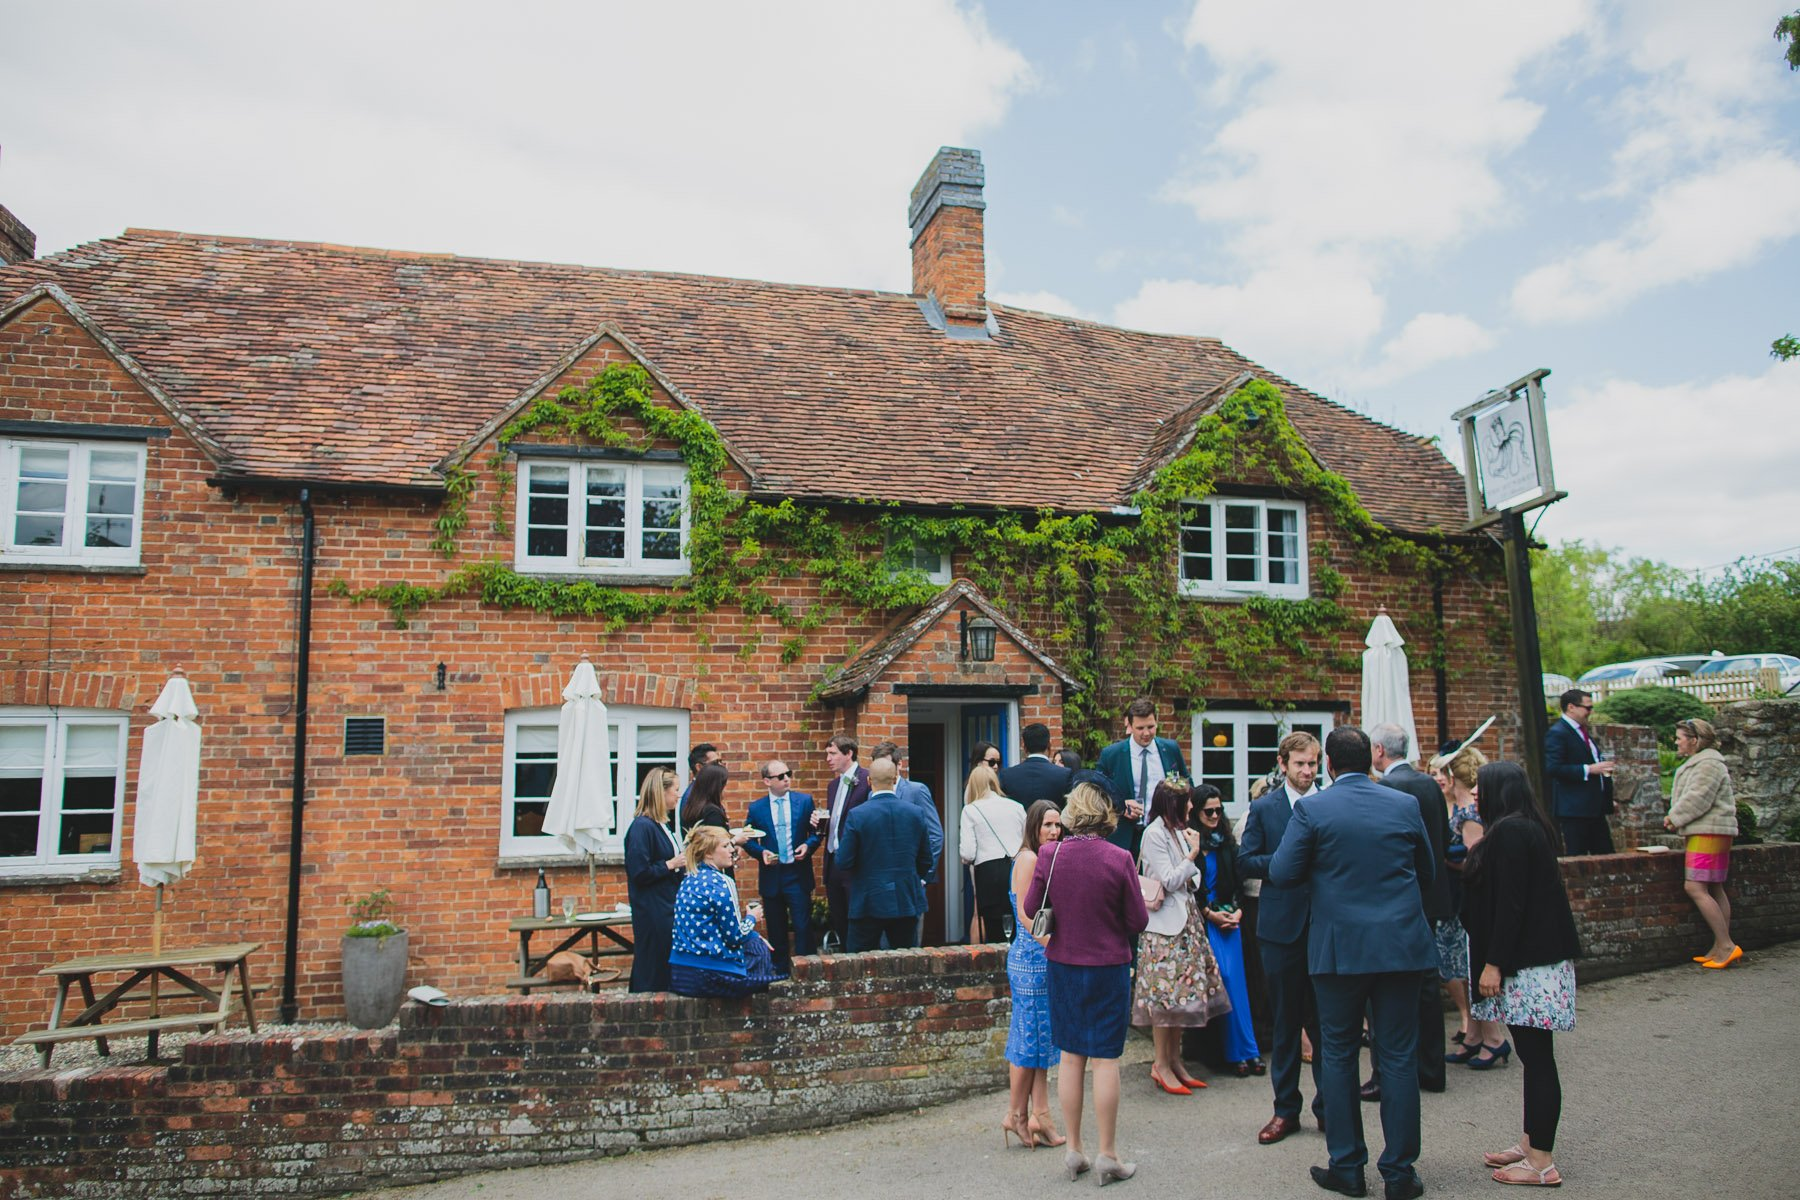 Buckinghamshire-Wedding-Lizzie-Duncan-043